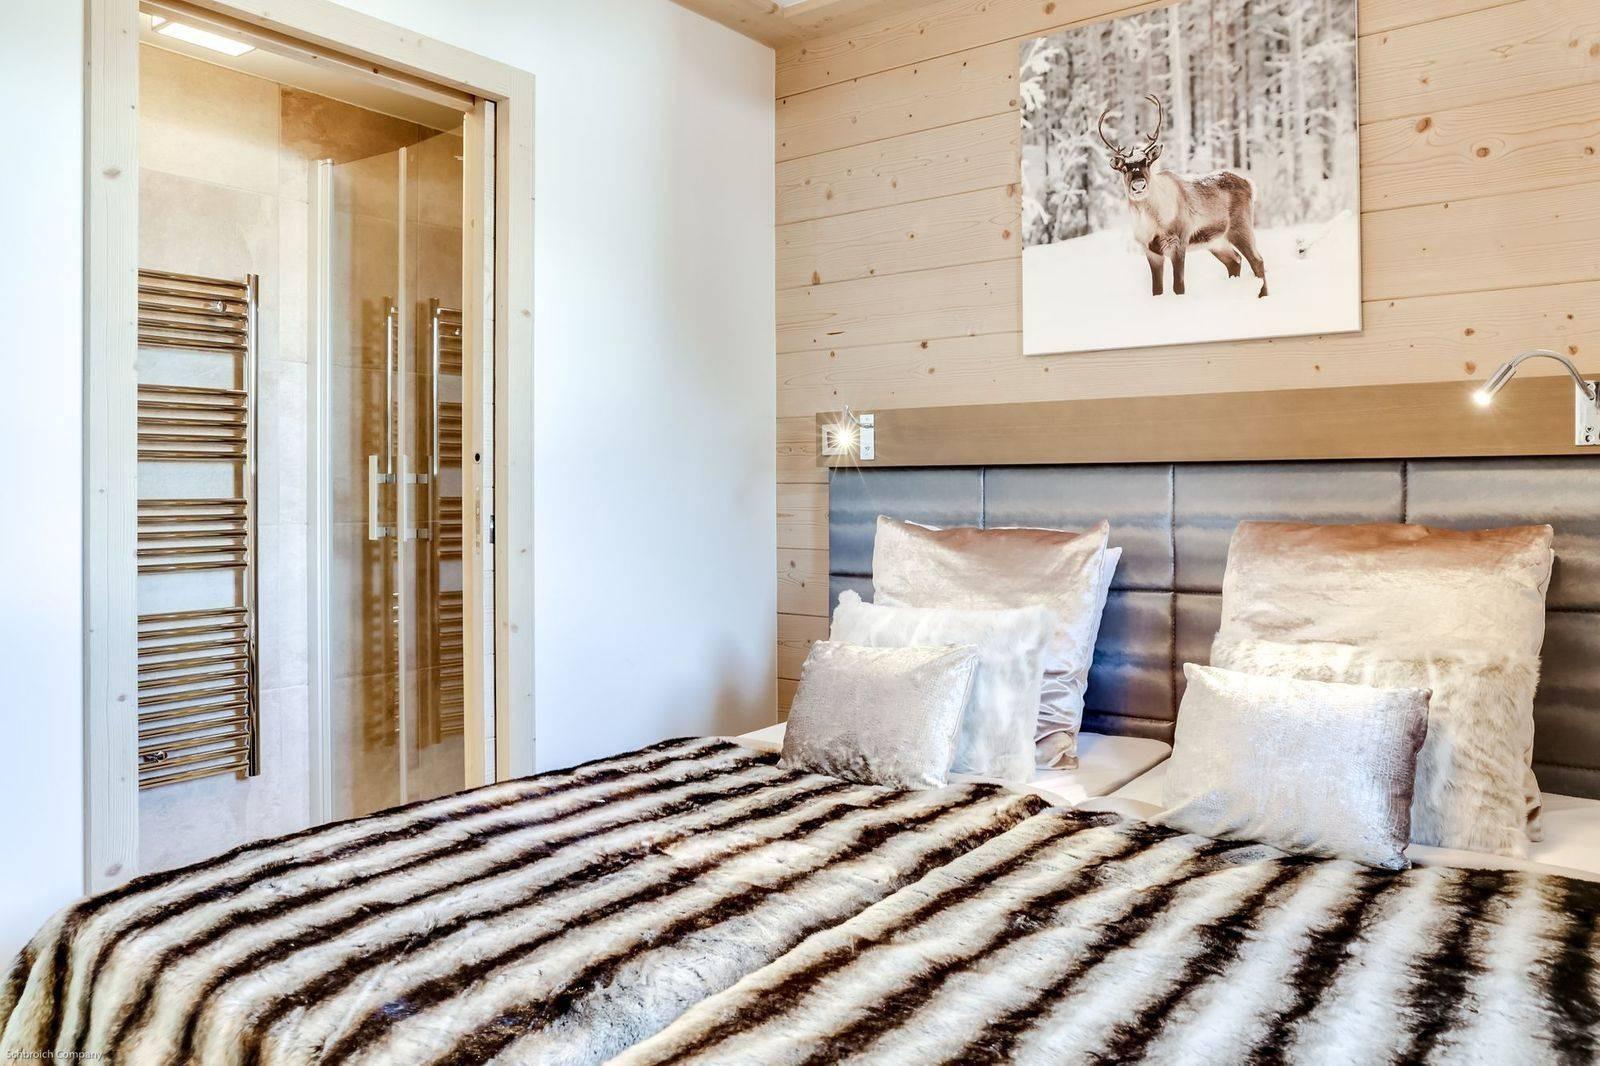 Courchevel 1550 Luxury Rental Appartment Telamite Bedroom 2